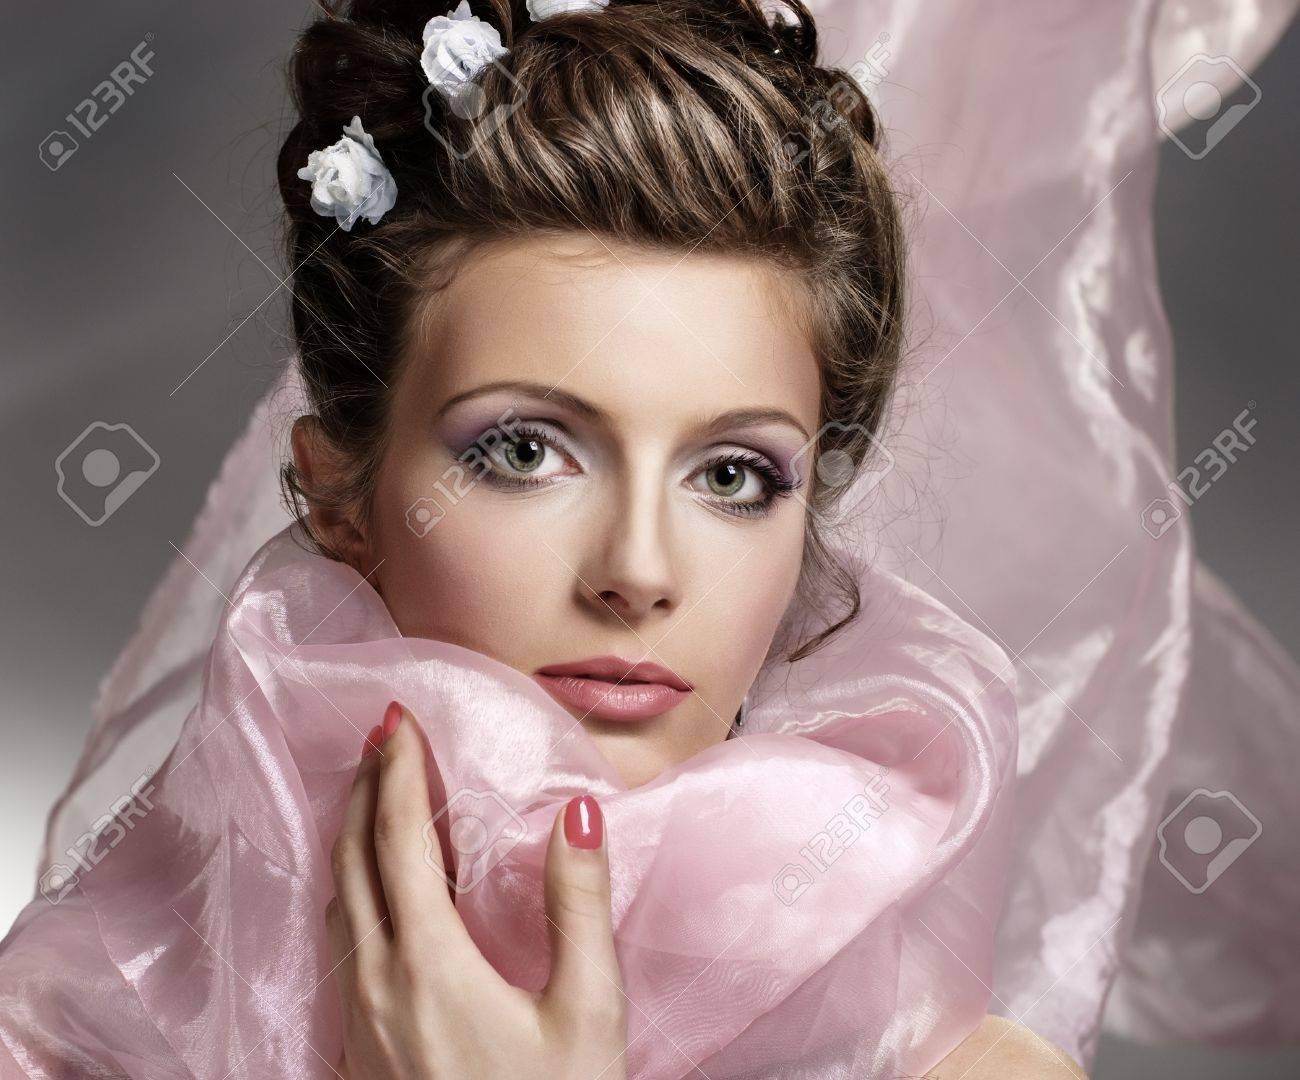 Young beautiful woman face Stock Photo - 9232466